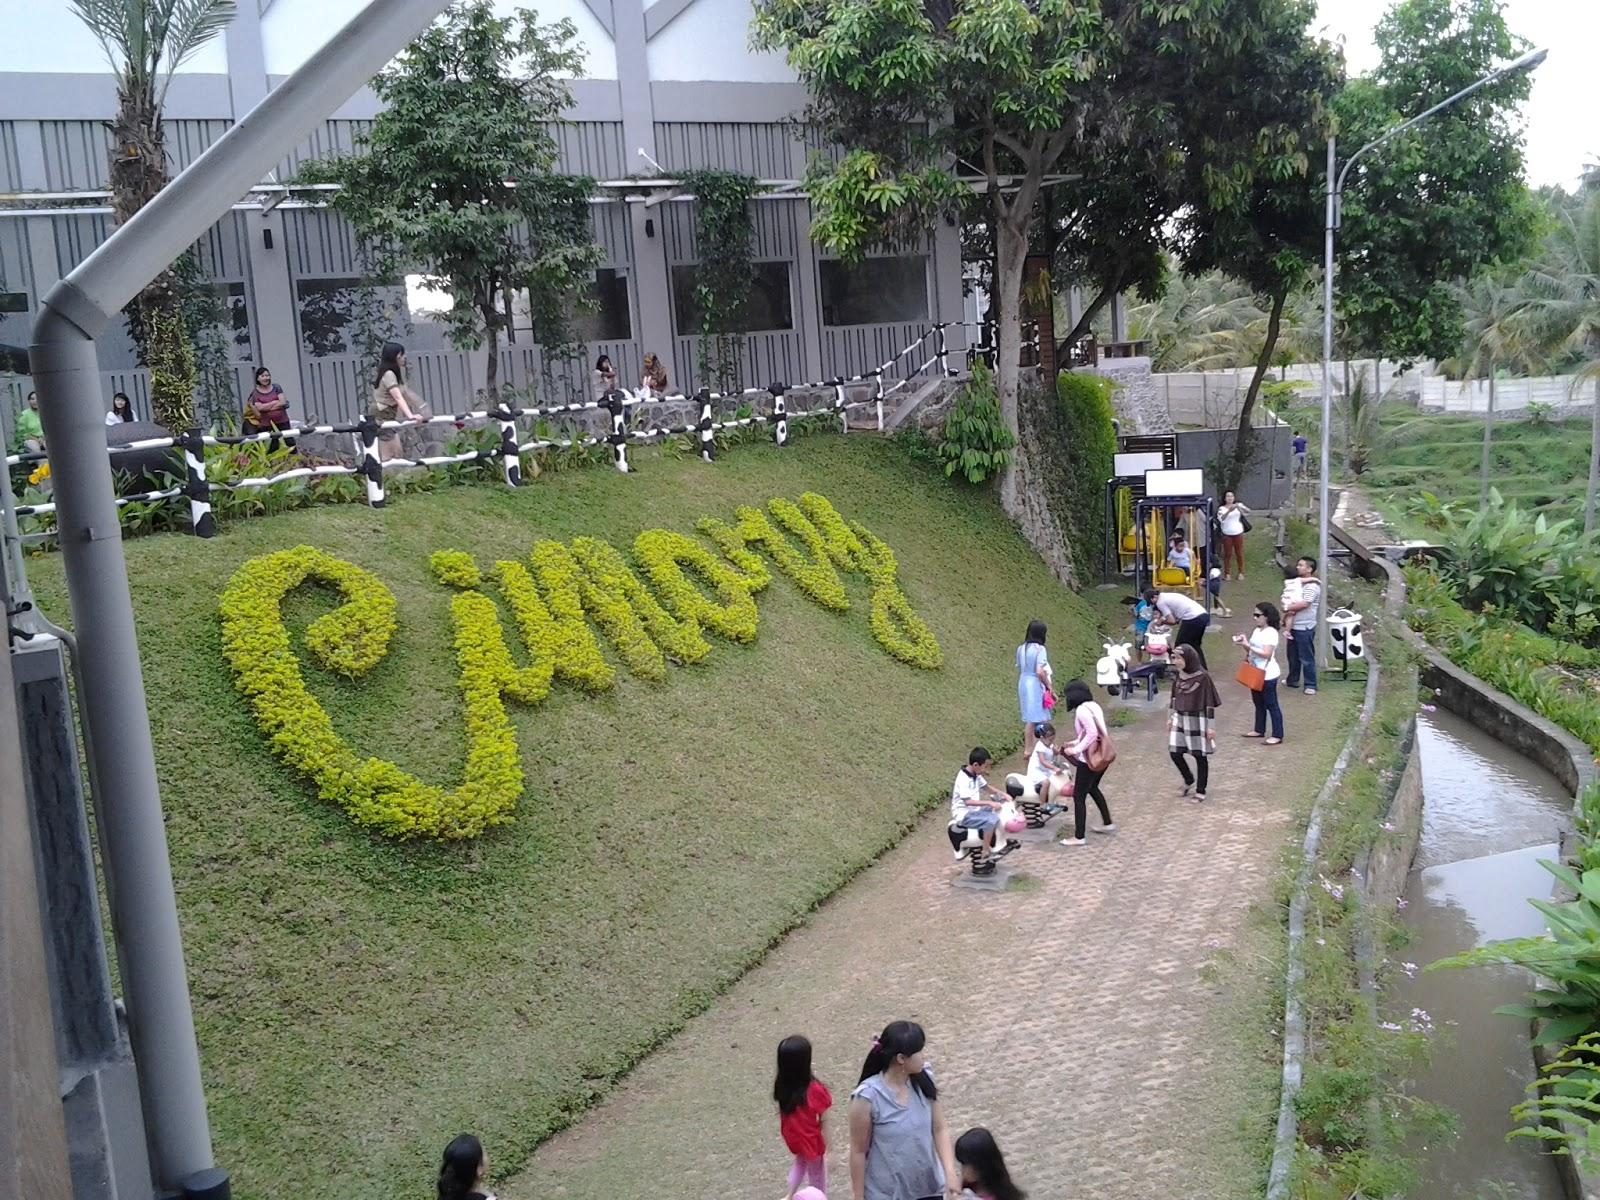 Image Wisata Cimory Malang